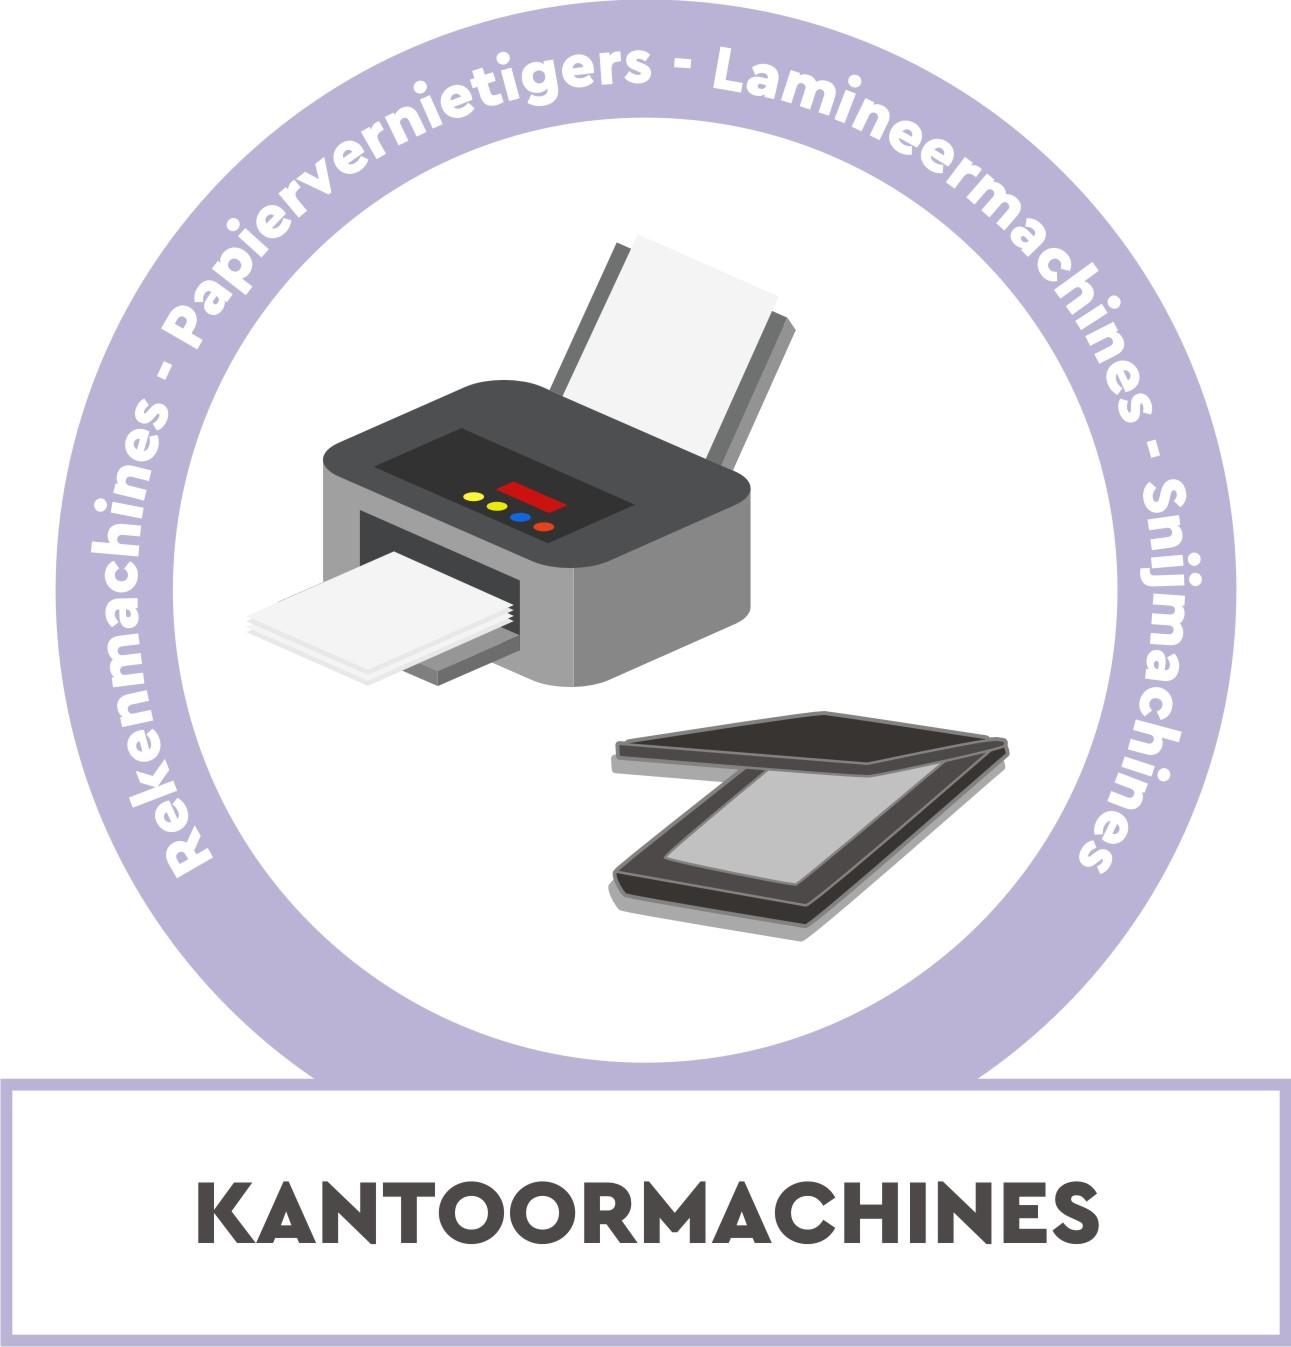 Papiervernietigers, rekenmachines, snijmachines, lamineermachines, inbindmachines, beletteringsystemen, ...